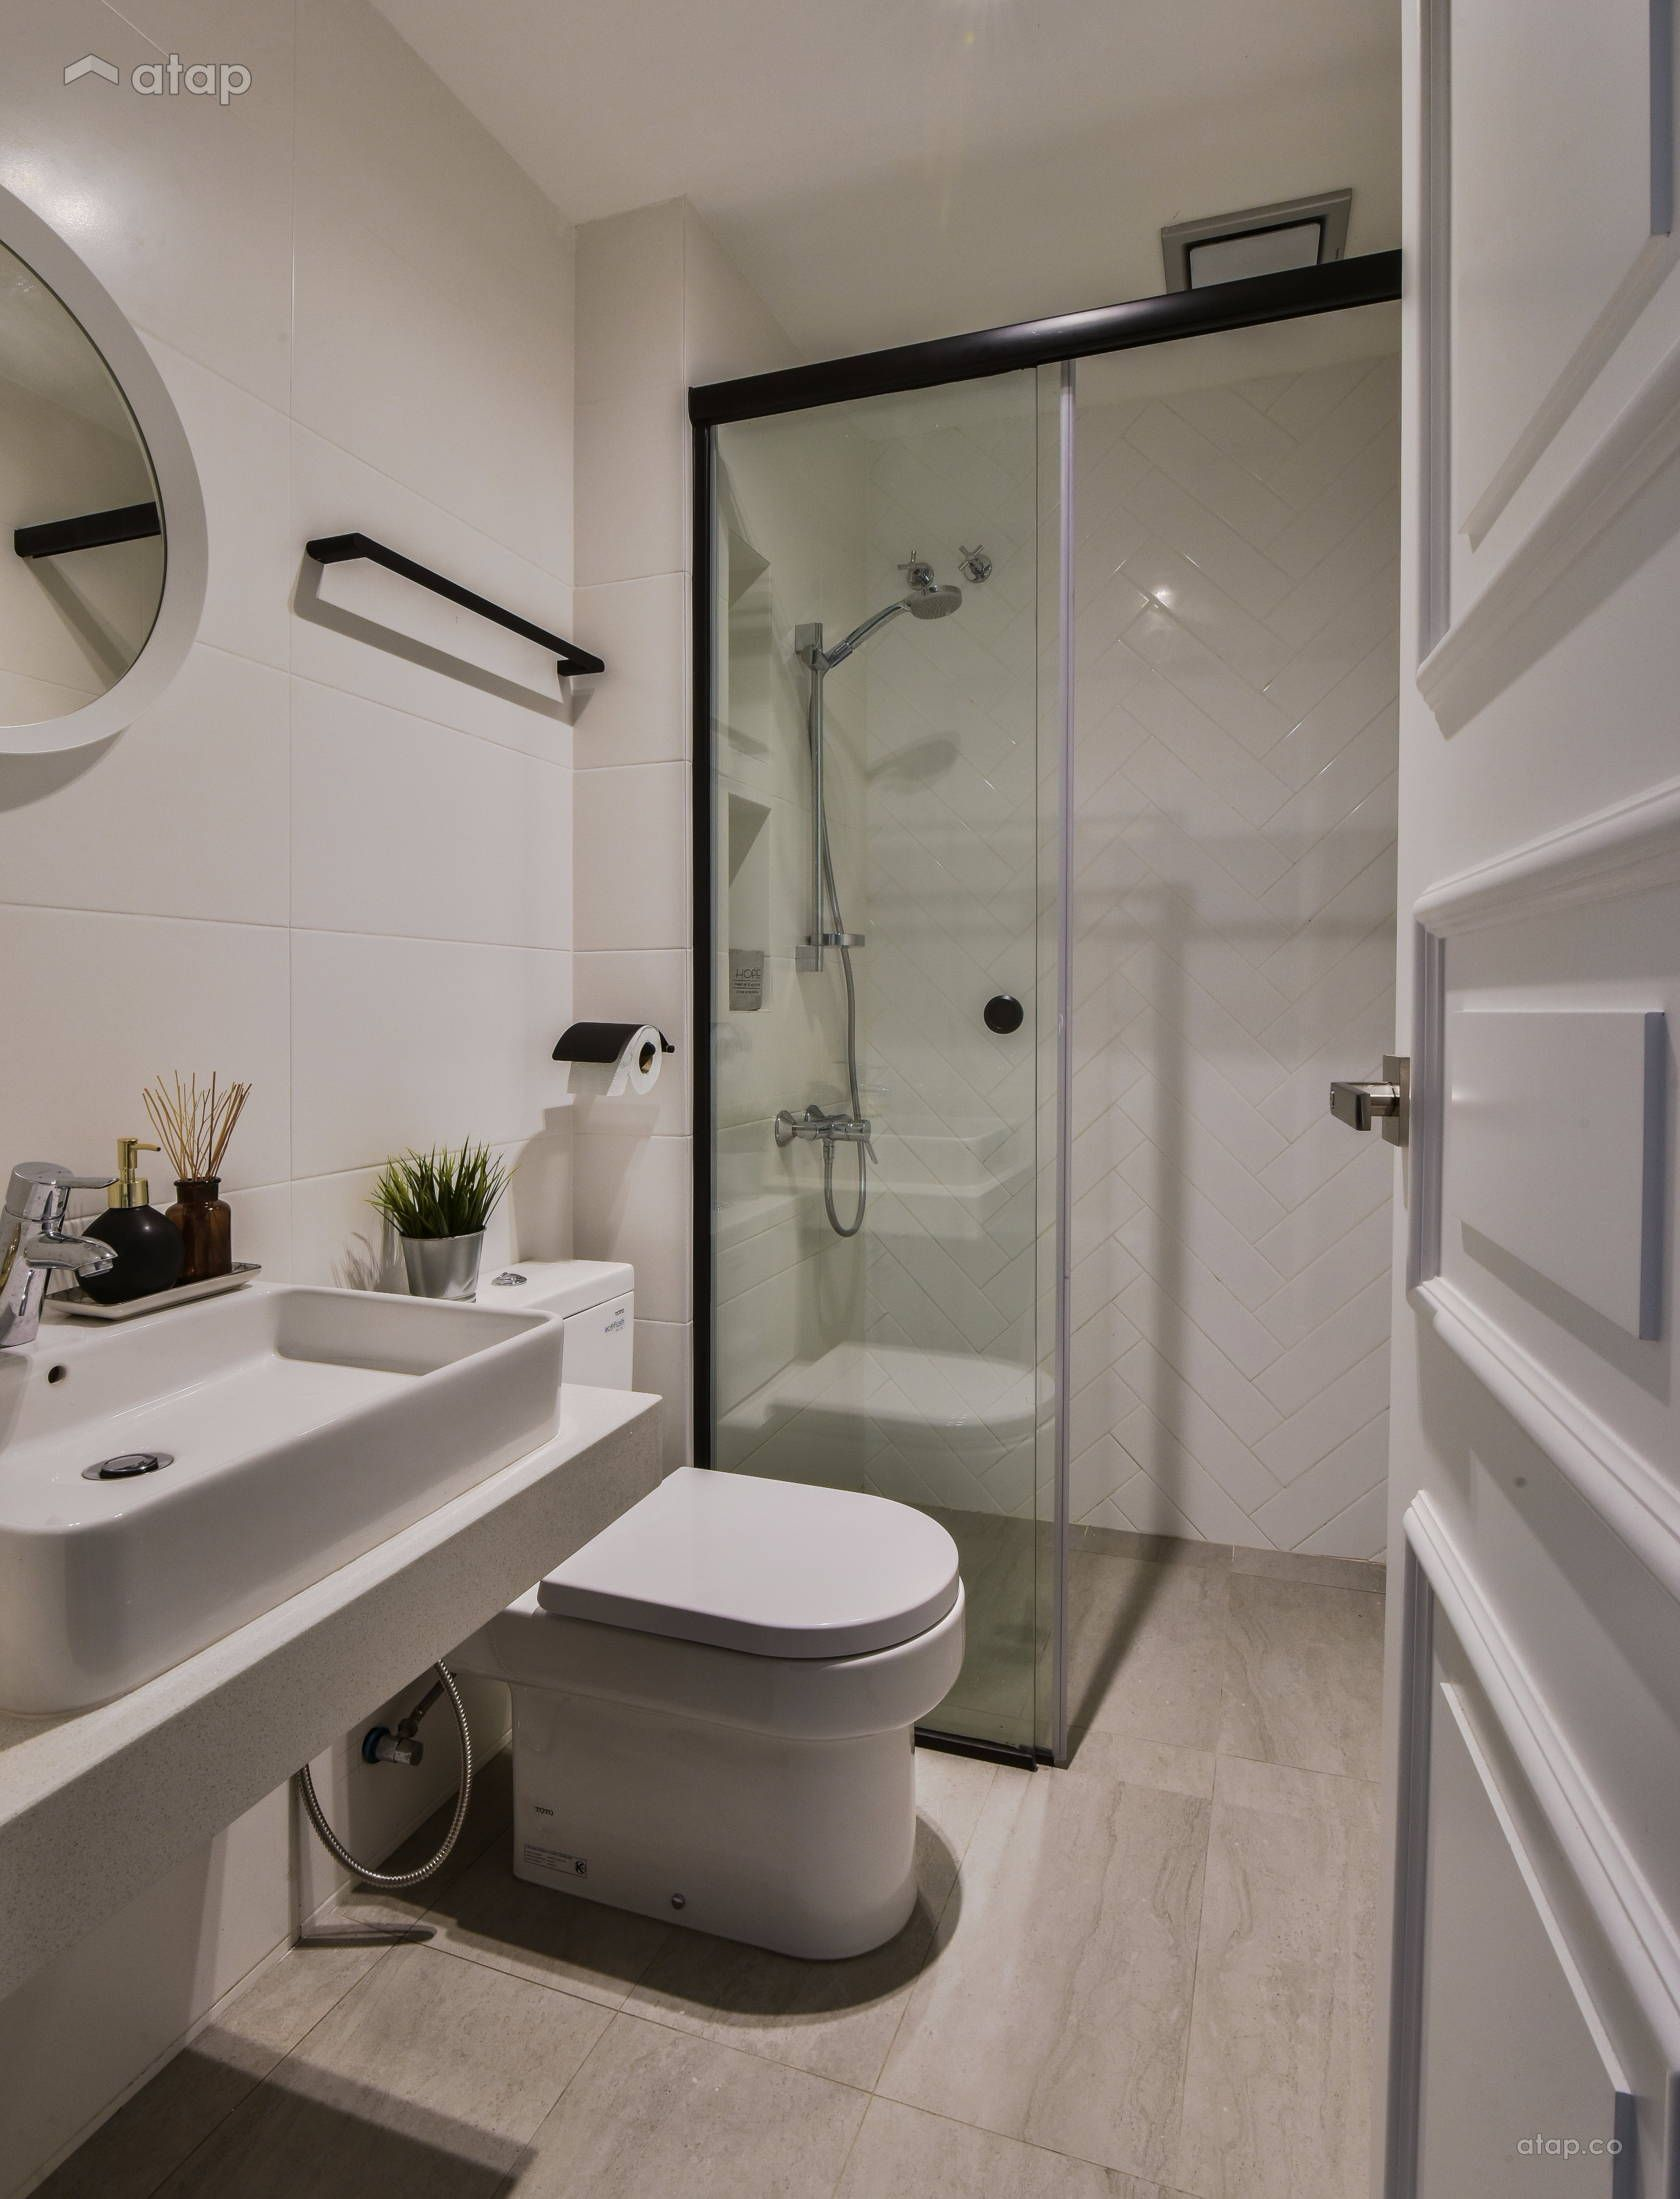 Minimalistic Scandinavian Bathroom Terrace Design Ideas Photos Malaysia Atap Co Bathroomdesignm Bathroom Remodel Cost Small Bathroom Design Small Bathroom